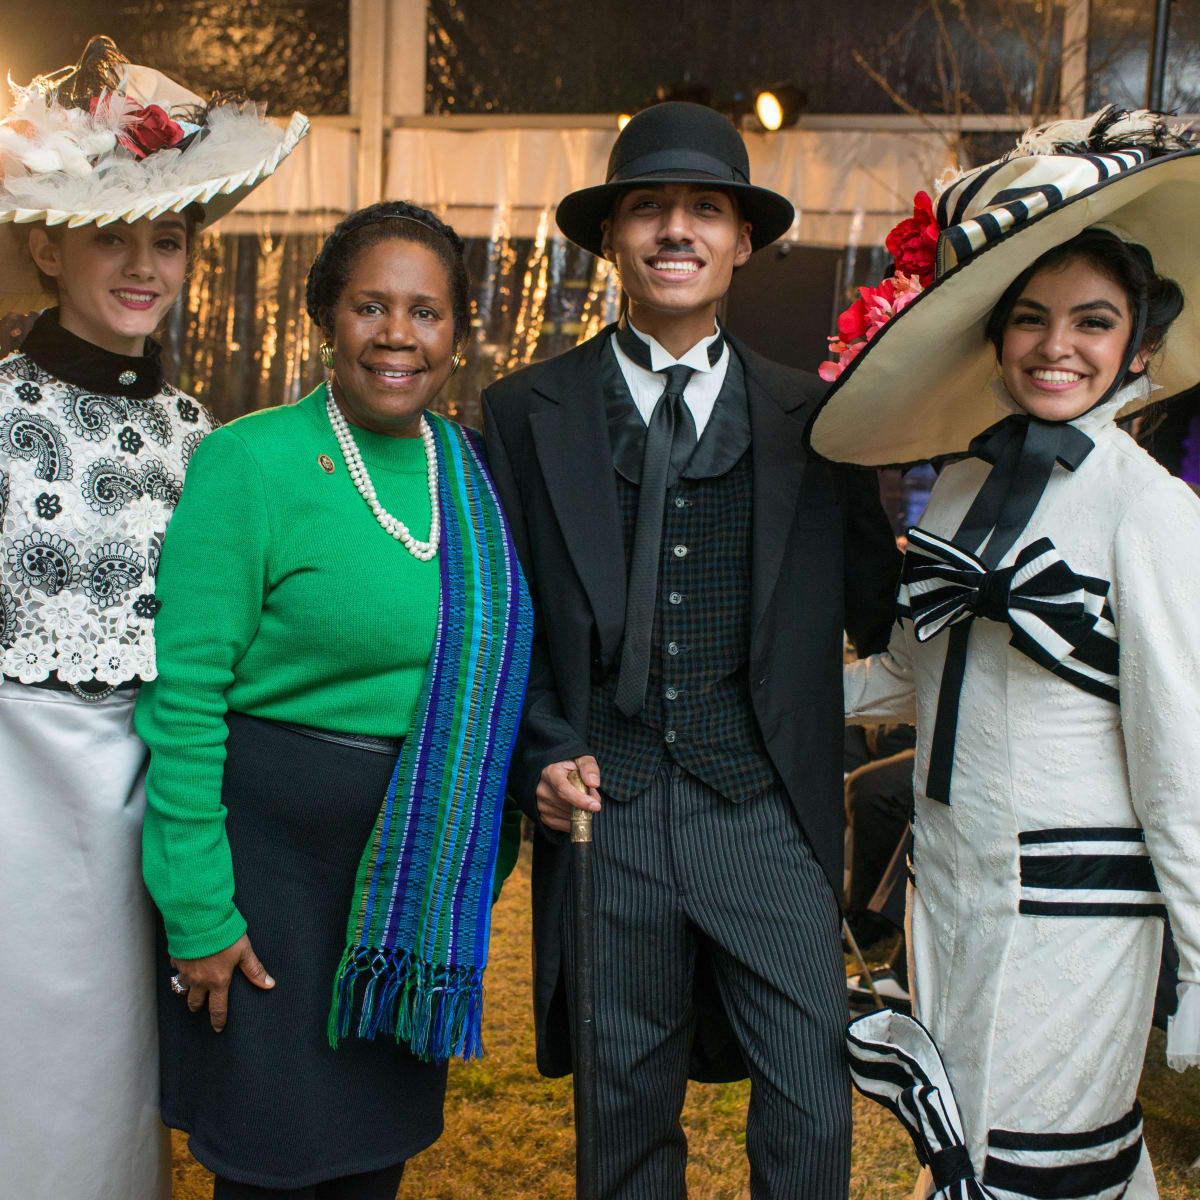 Hermann Park 100th anniversary, March 2016, Alexia Garza, Sheila Jackson Lee, Isaiah Flores, Magbis Perez